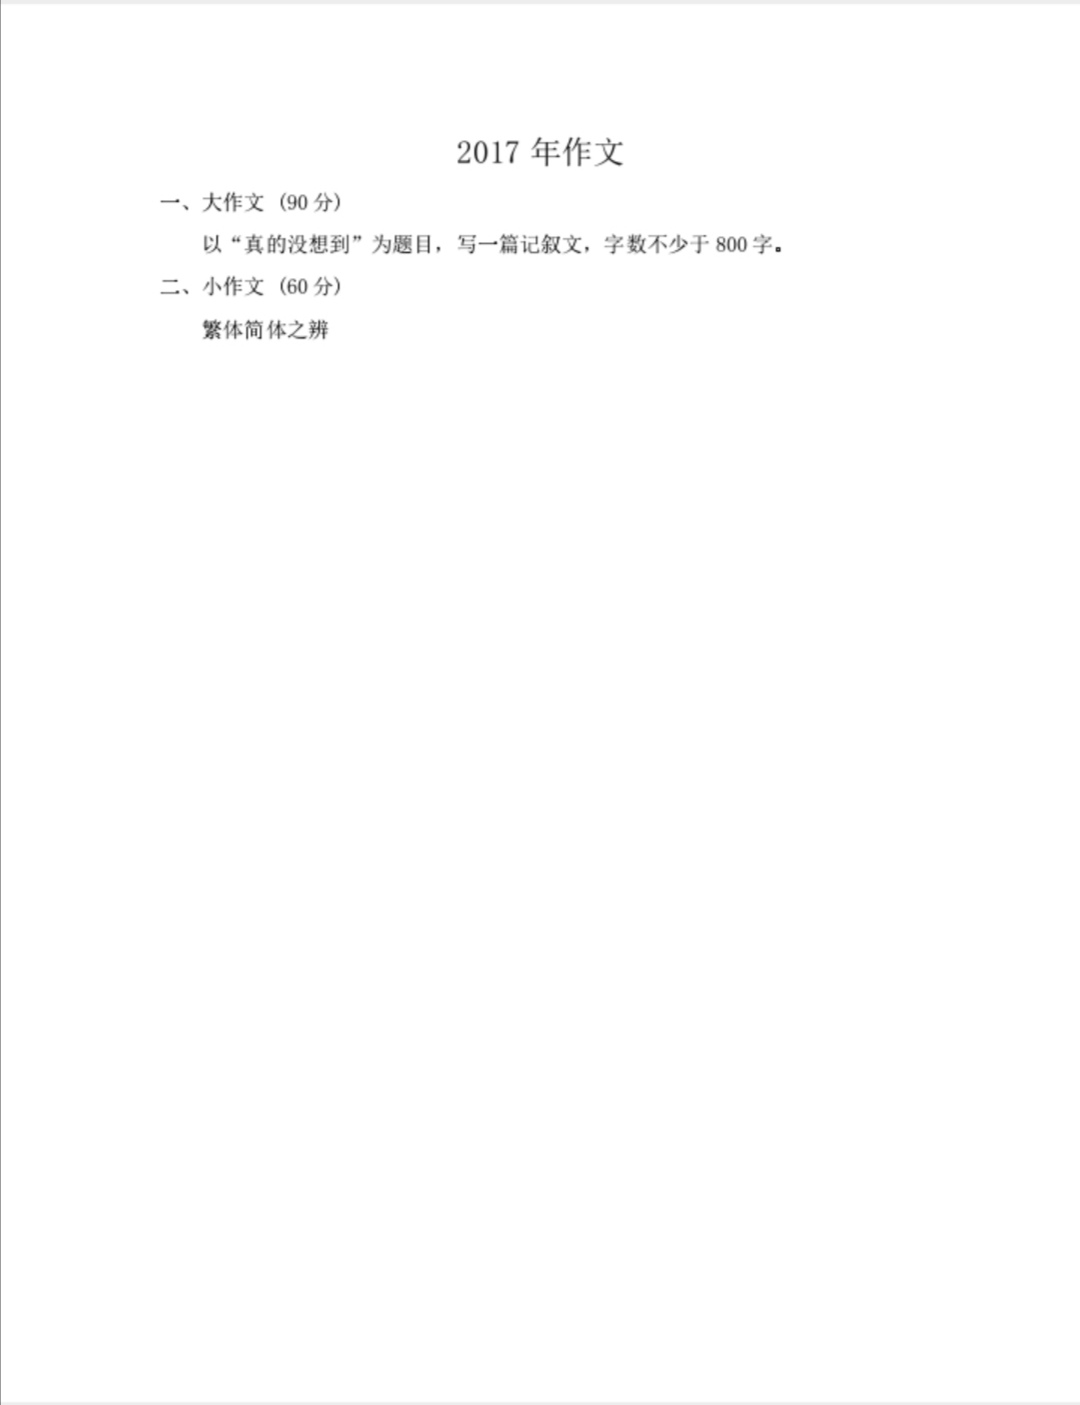 IMG_88A20B96D809B3DFEF1427C22F7D12.jpeg